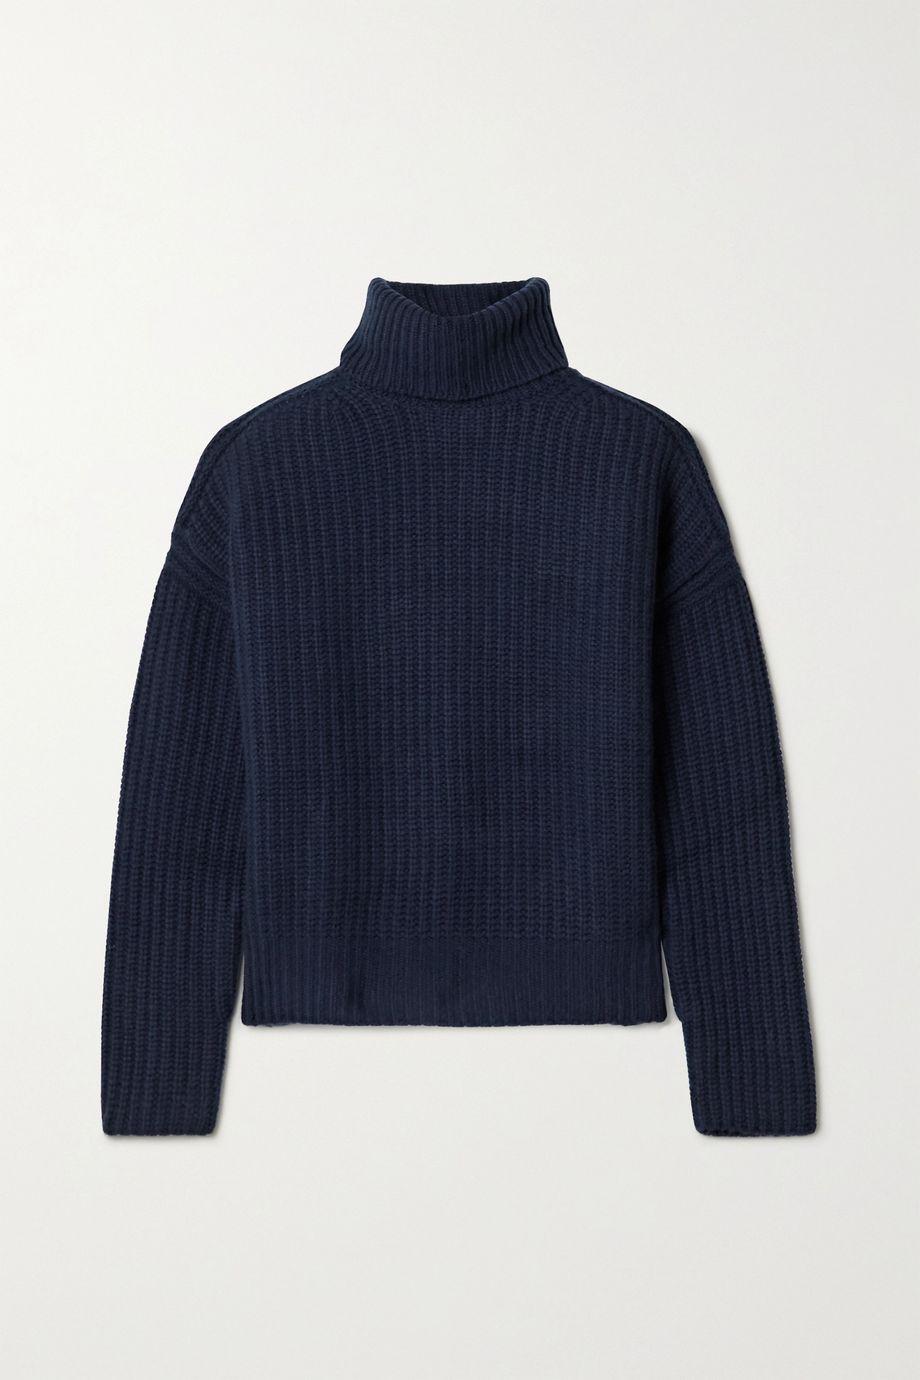 La Ligne 罗纹羊绒高领毛衣